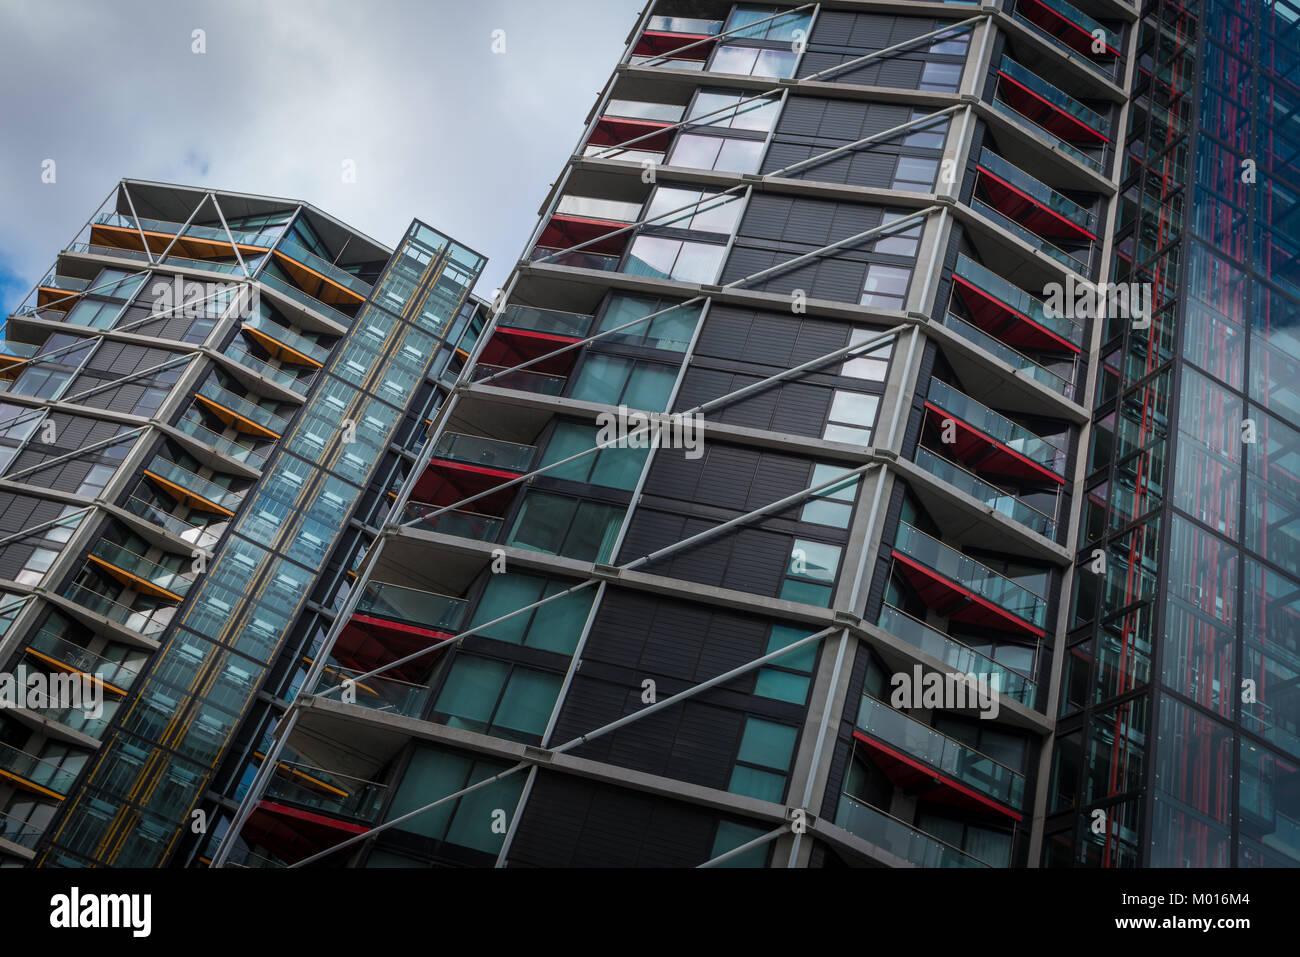 Riverlight, a new development on the River Thames in Nine Elms, London, United Kingdom - Stock Image